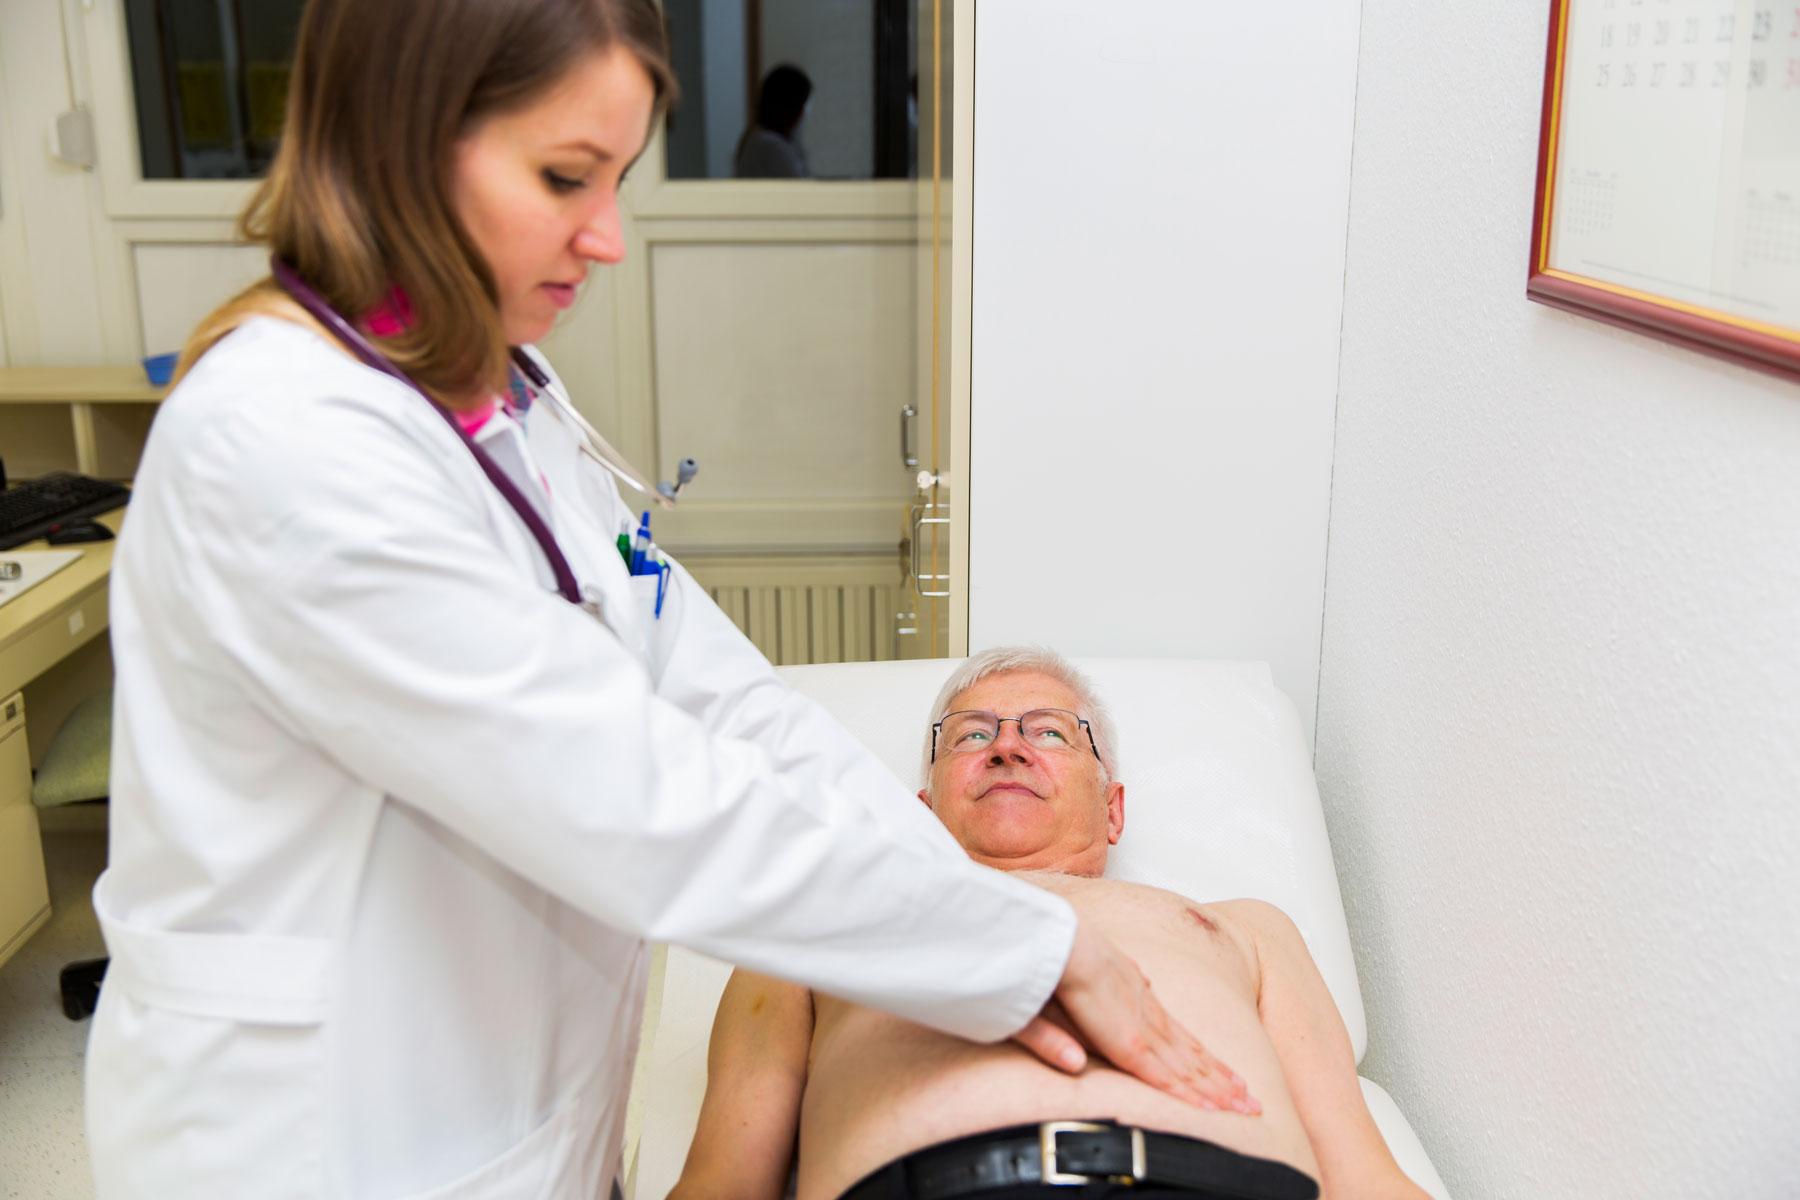 Zara whites and doctor exam